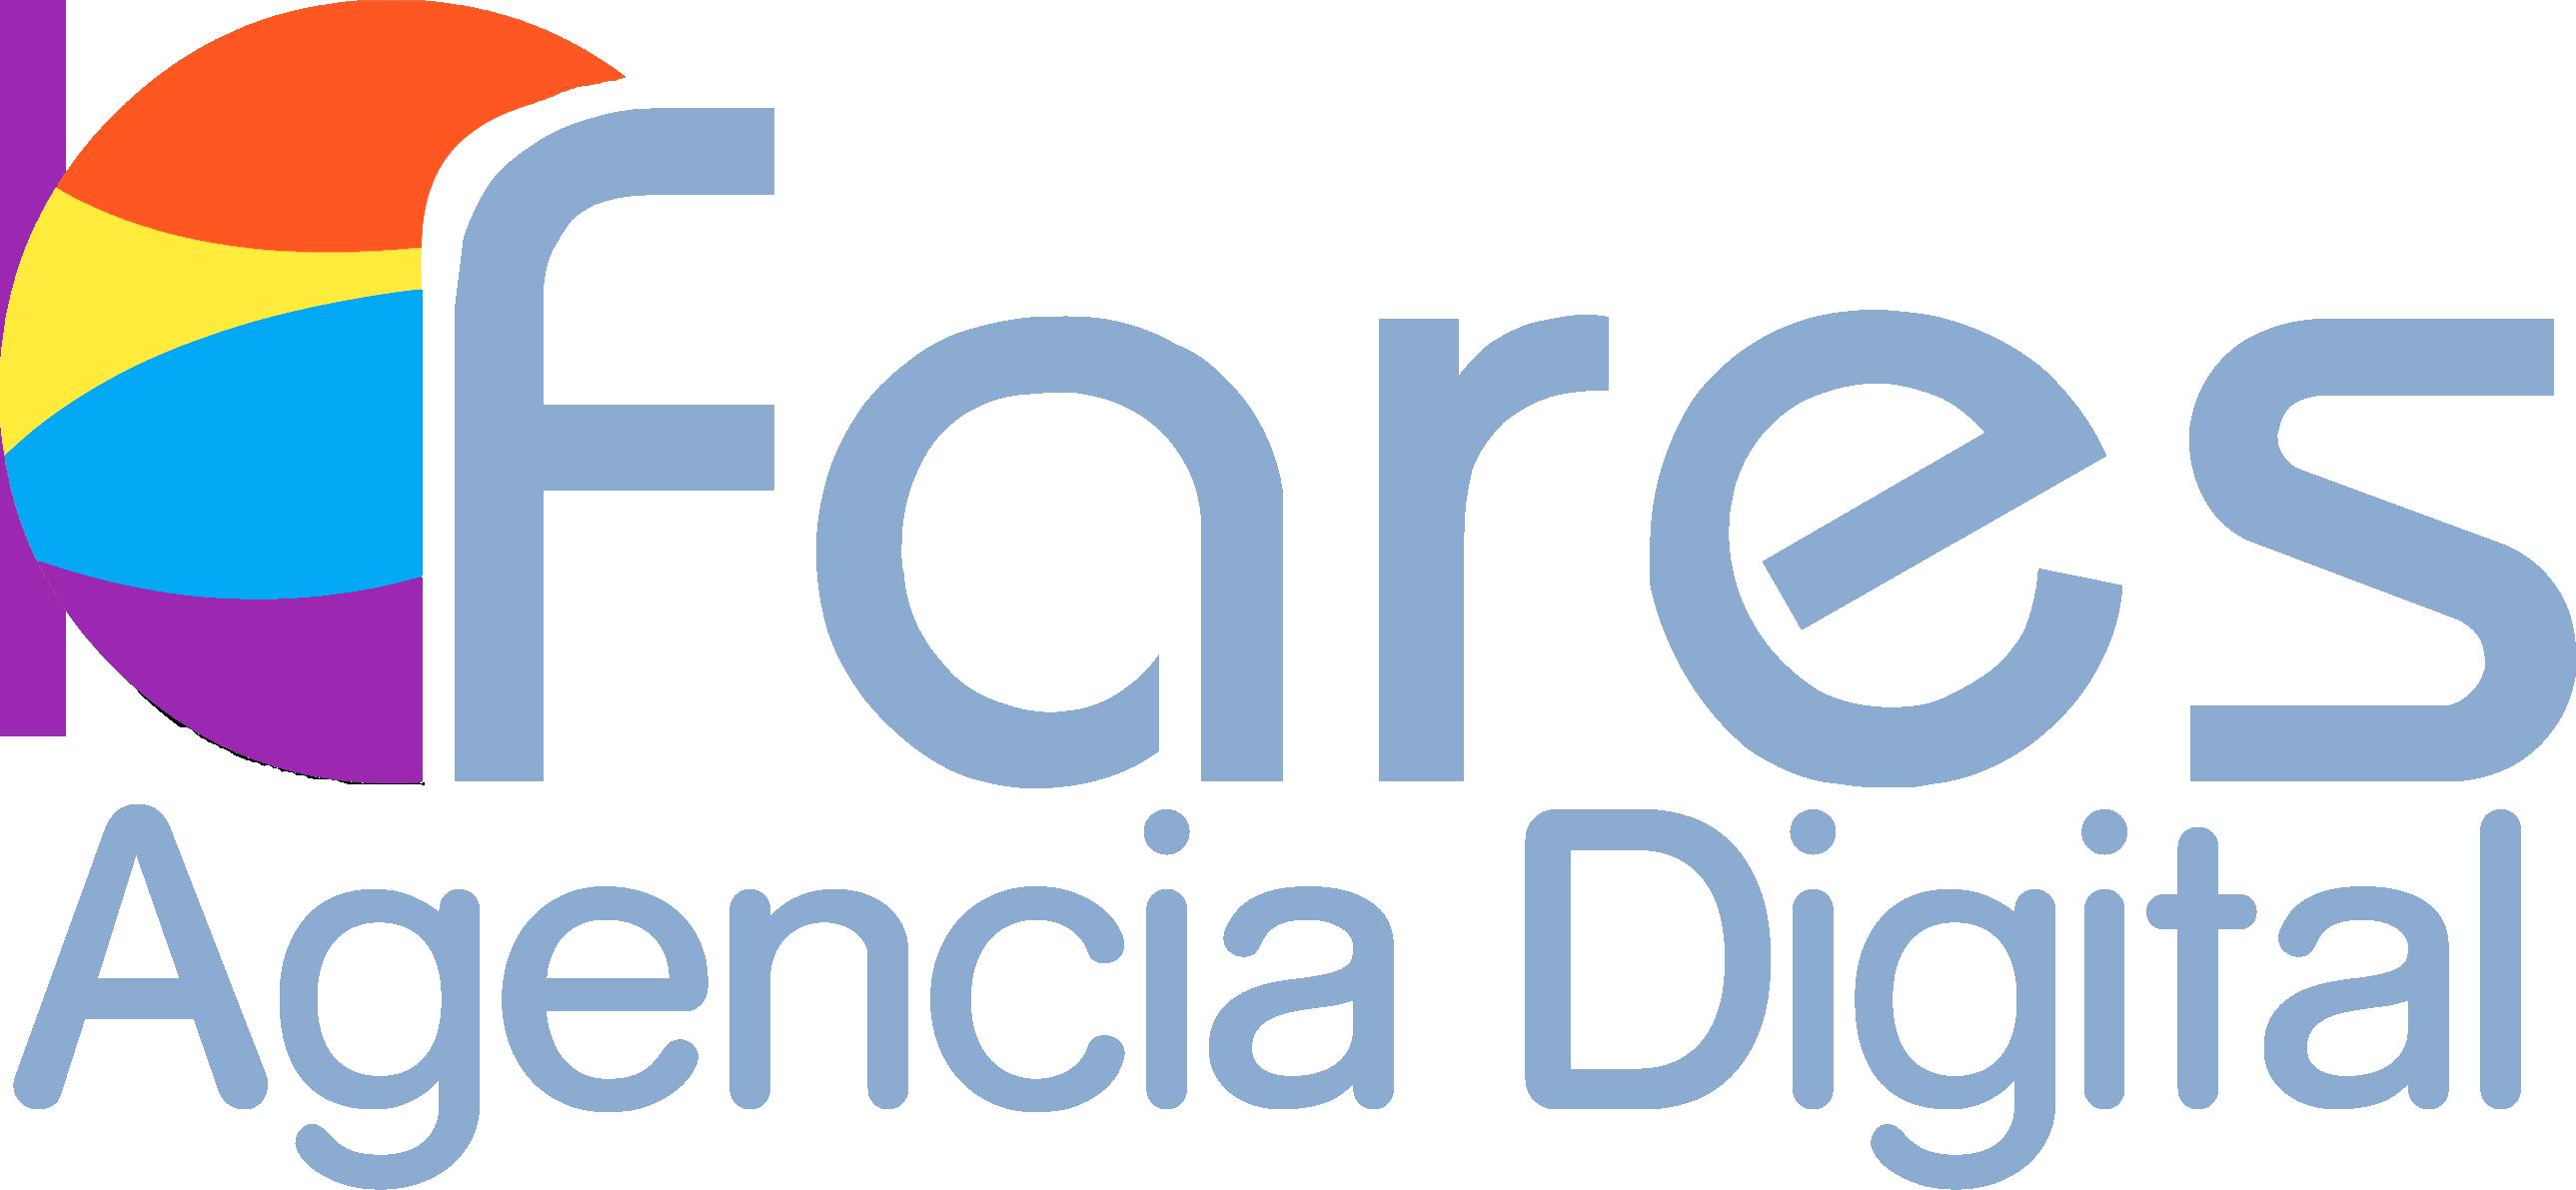 Fares Agencia Digital